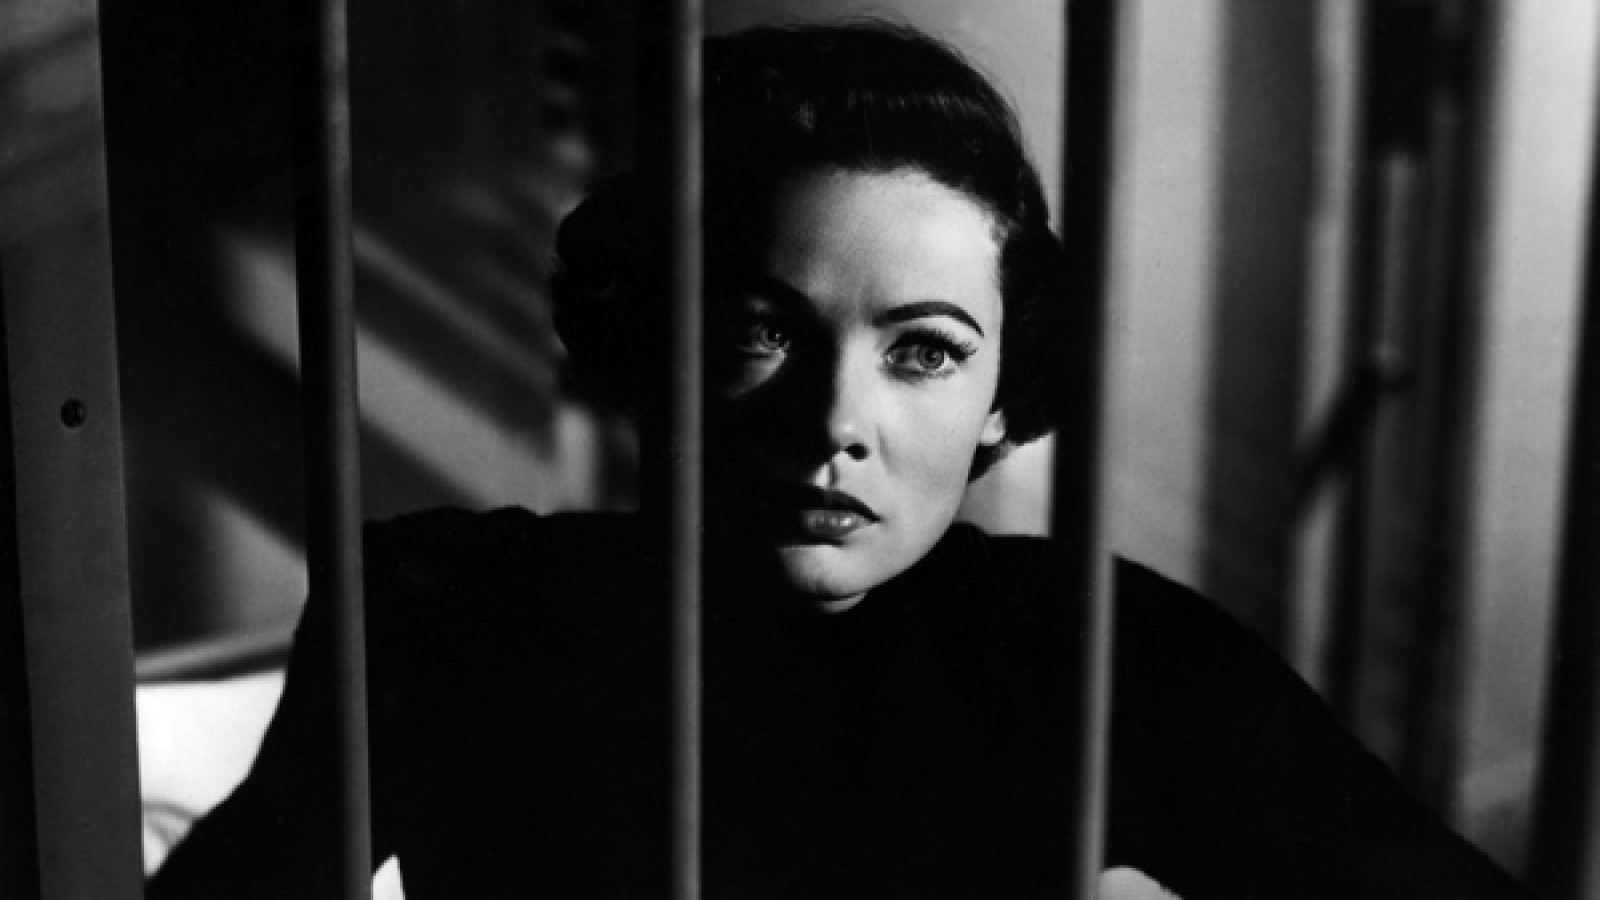 A LADRA (1949): A natureza envolvente do cinema de Otto Preminger